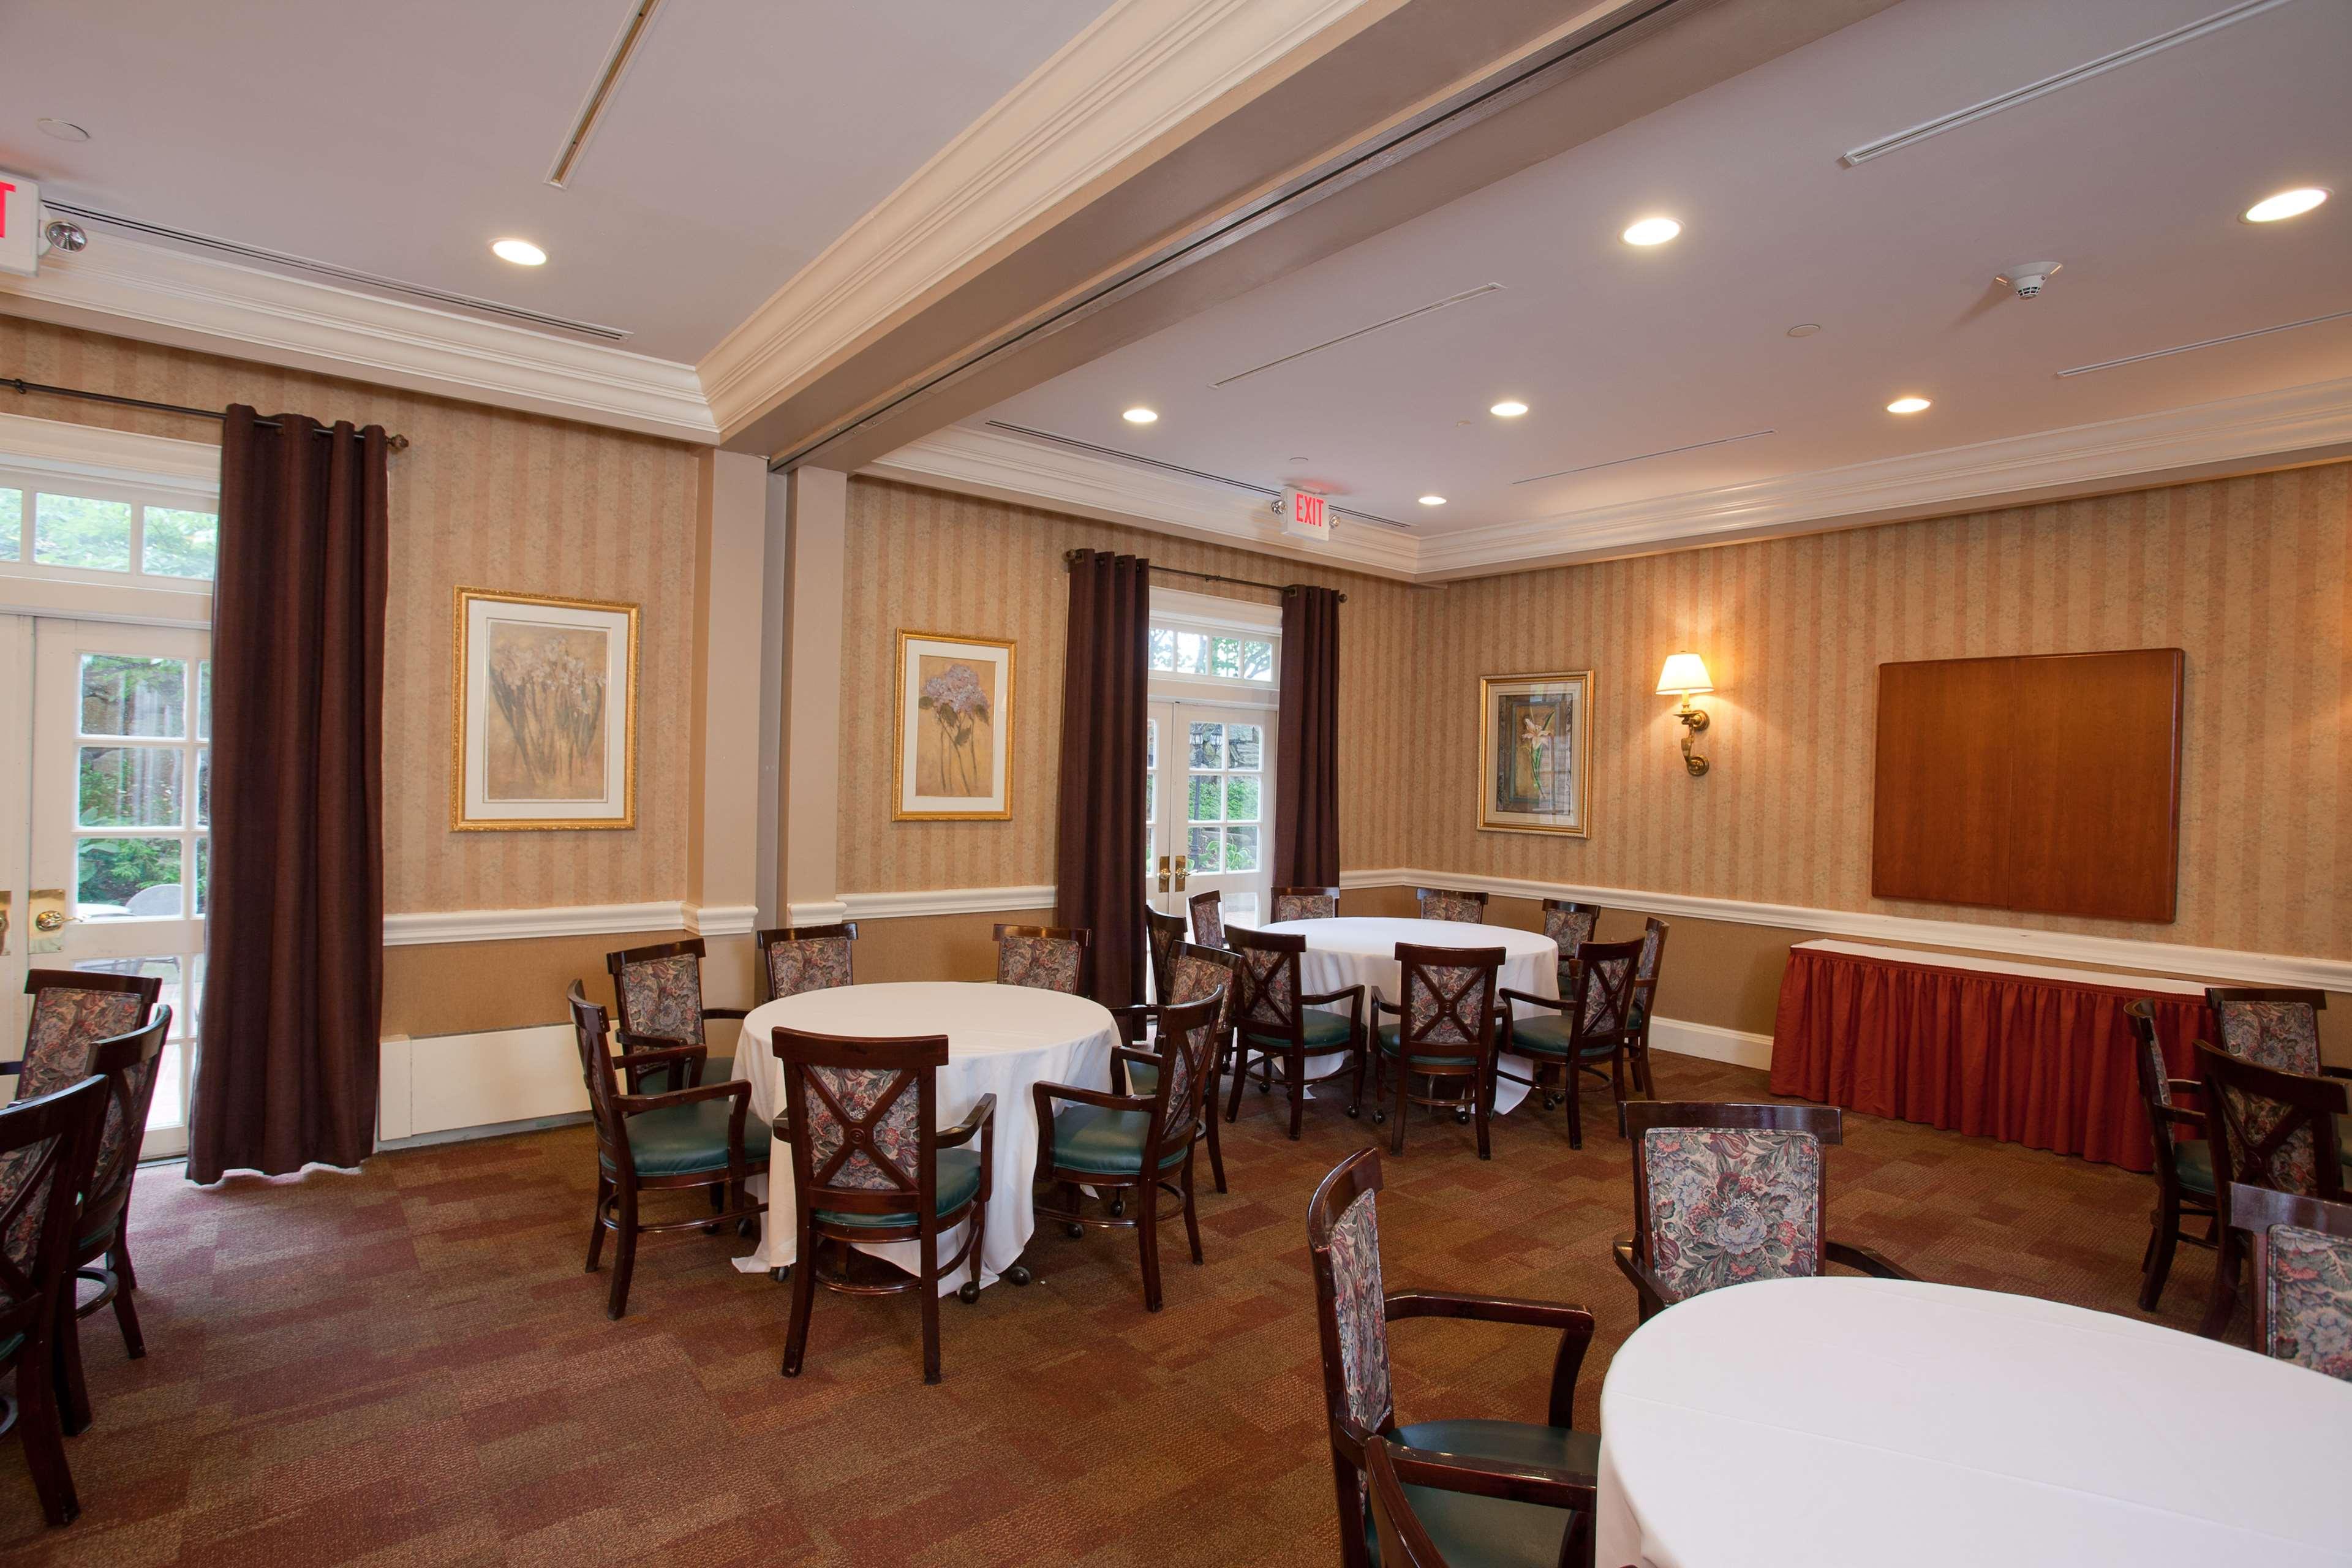 Hampton Inn & Suites Stamford image 43